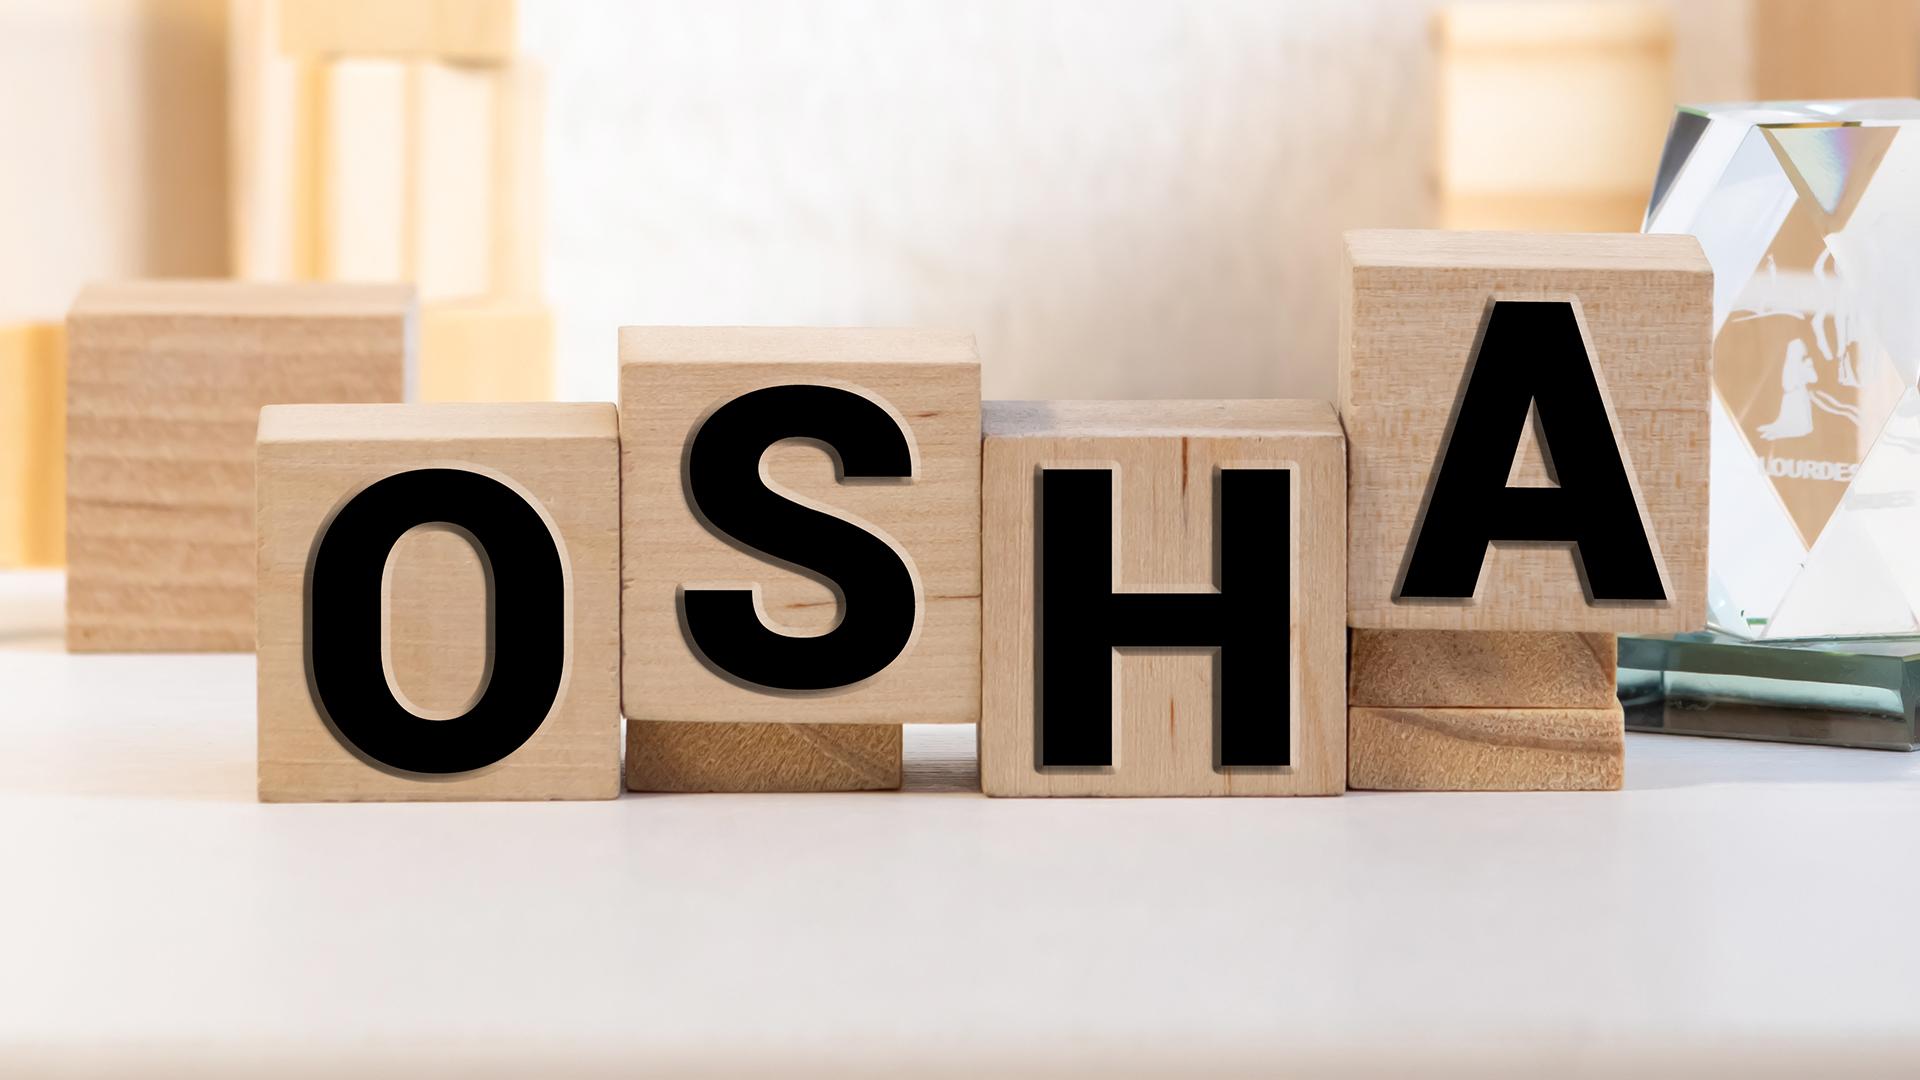 osha reporting and recordkeeping